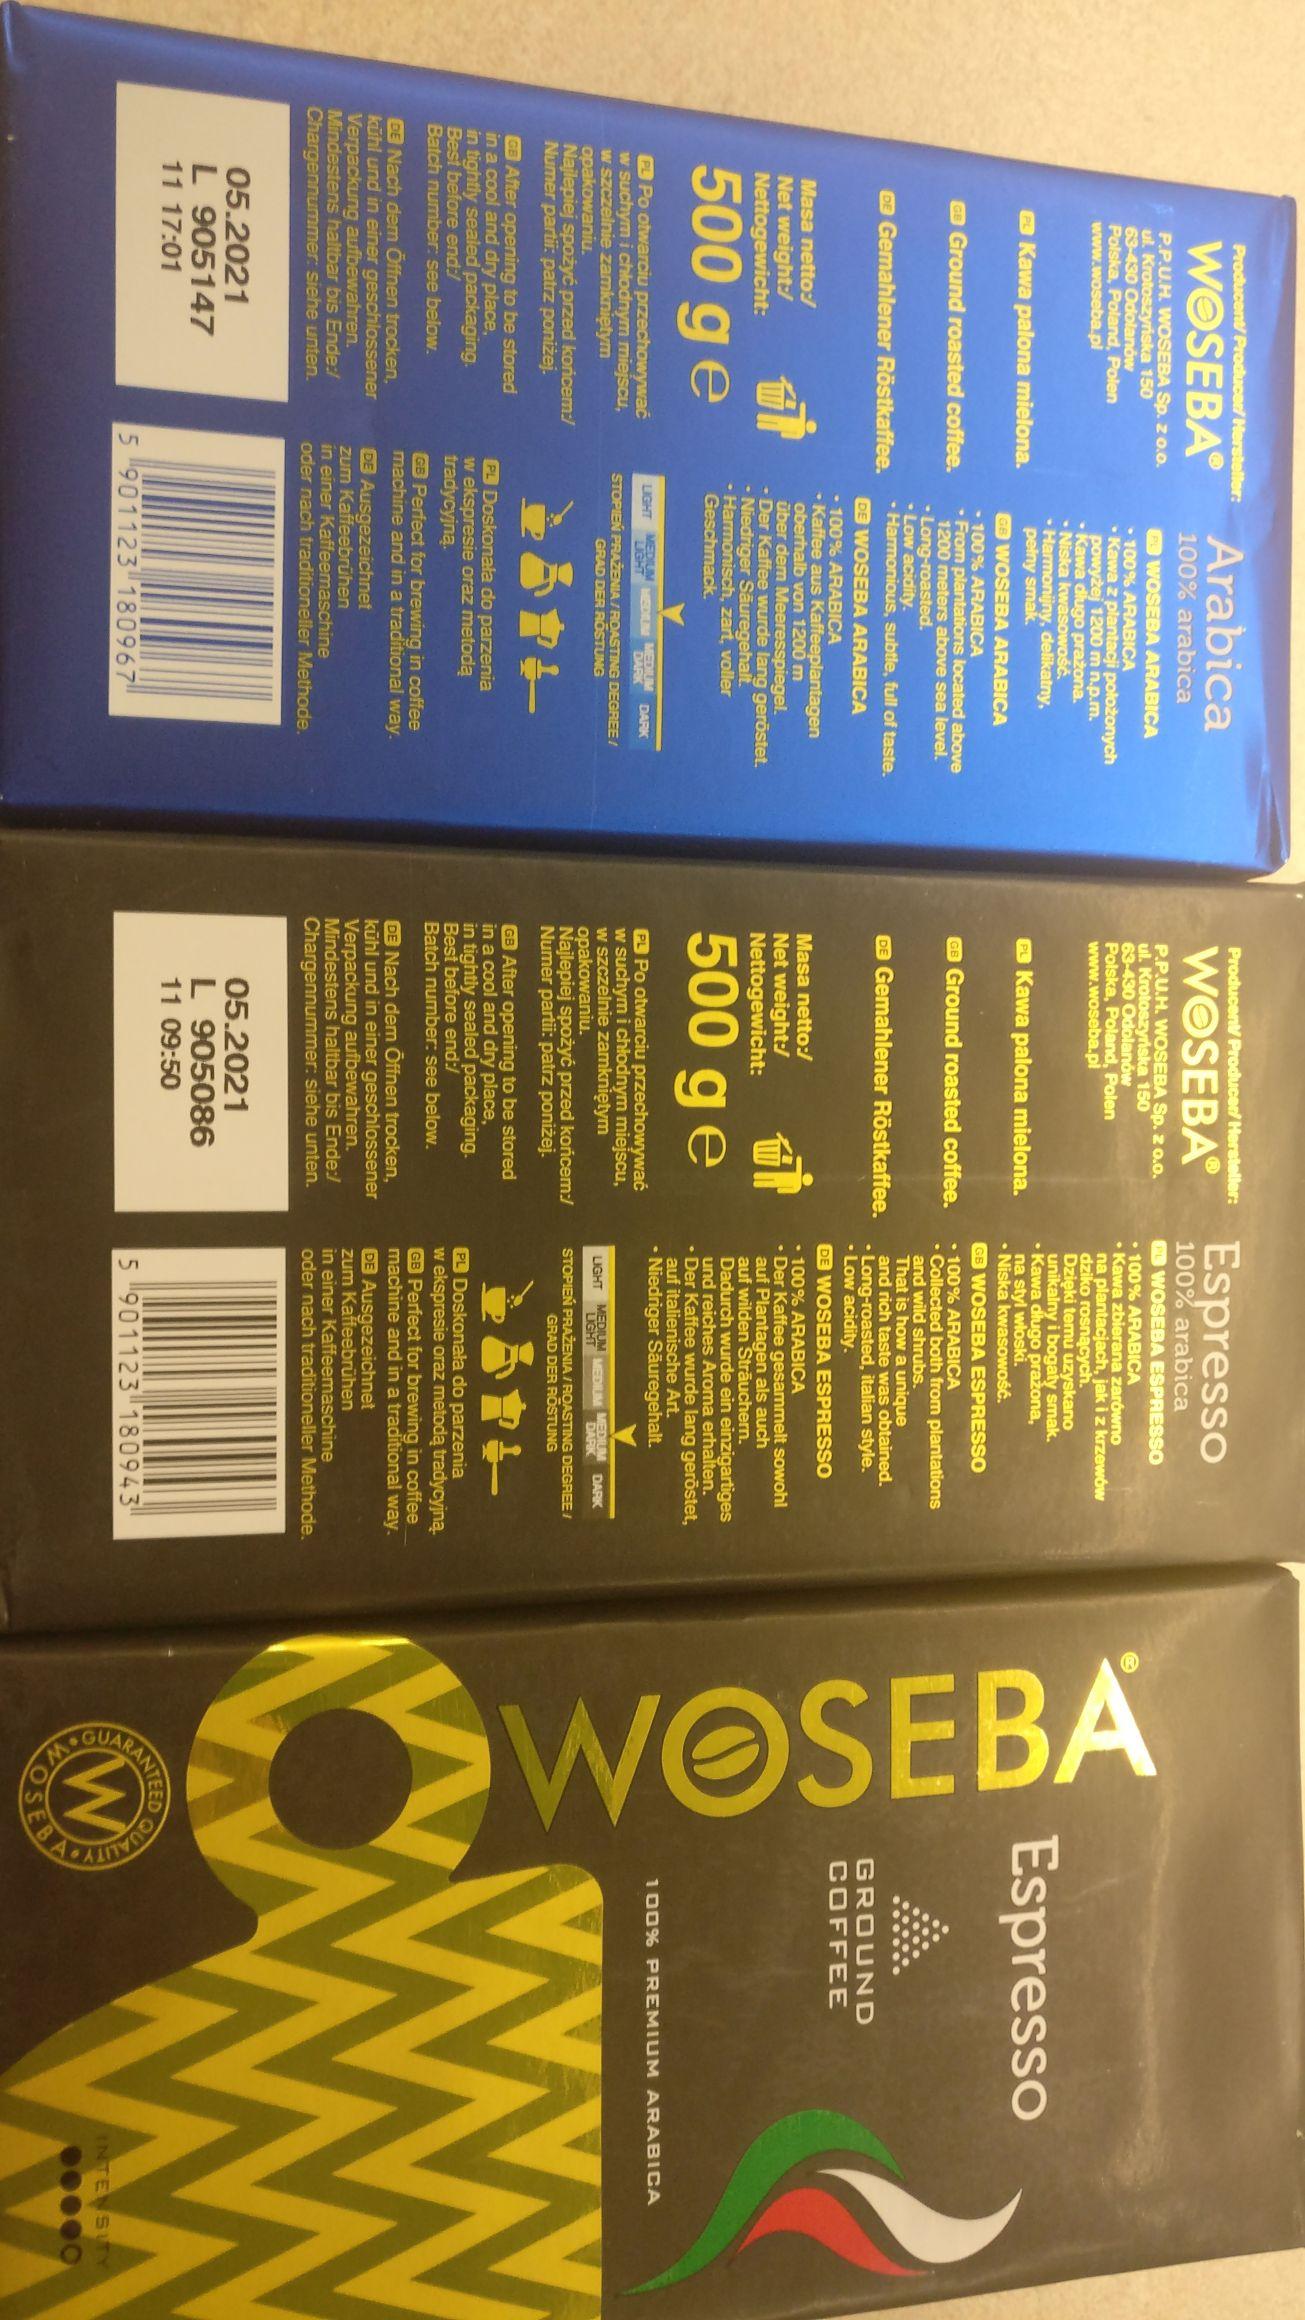 Woseba Espresso, Arabica, Brazil 500g mielona. @leclerc Warszawa Jutrzenki